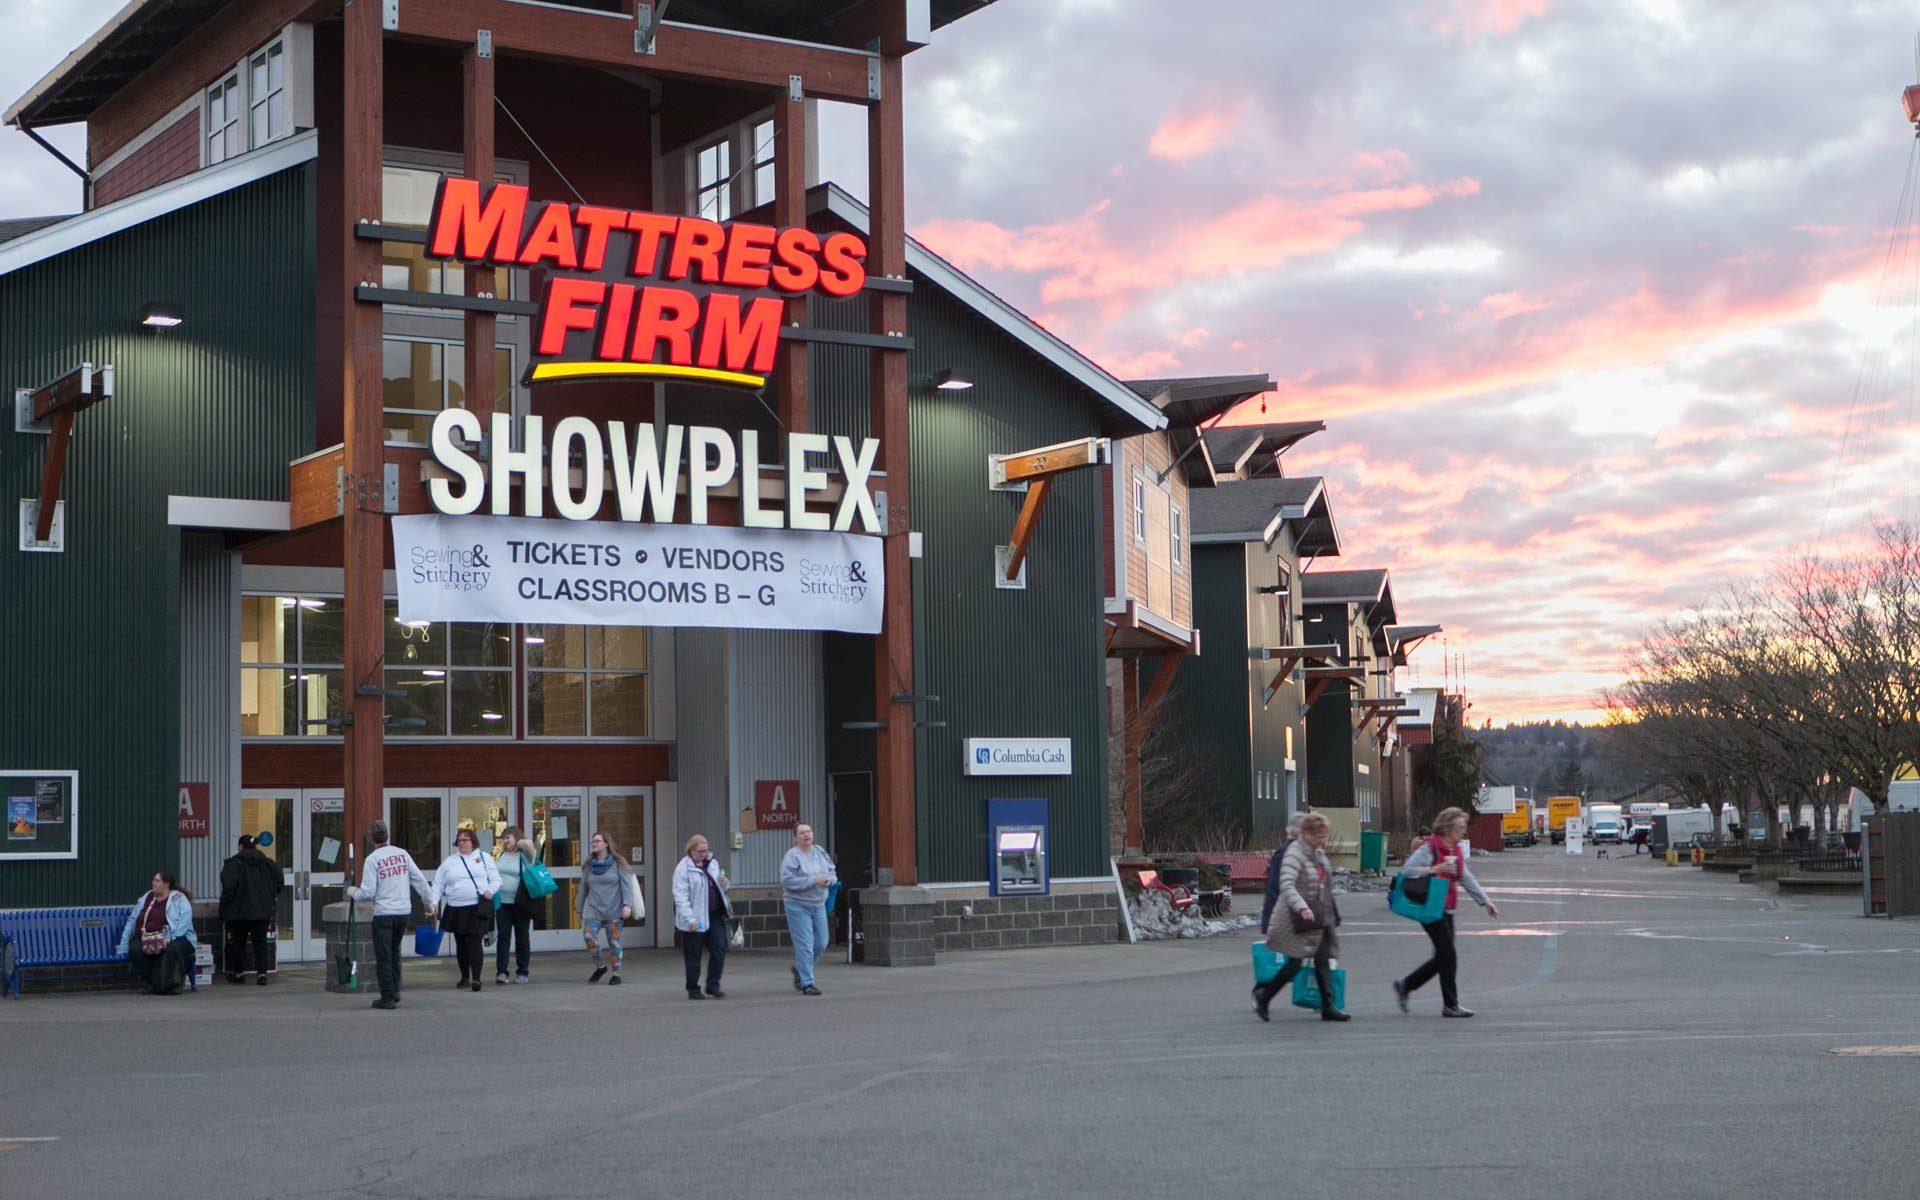 Shoppers exit the Showplex Building at sunset.